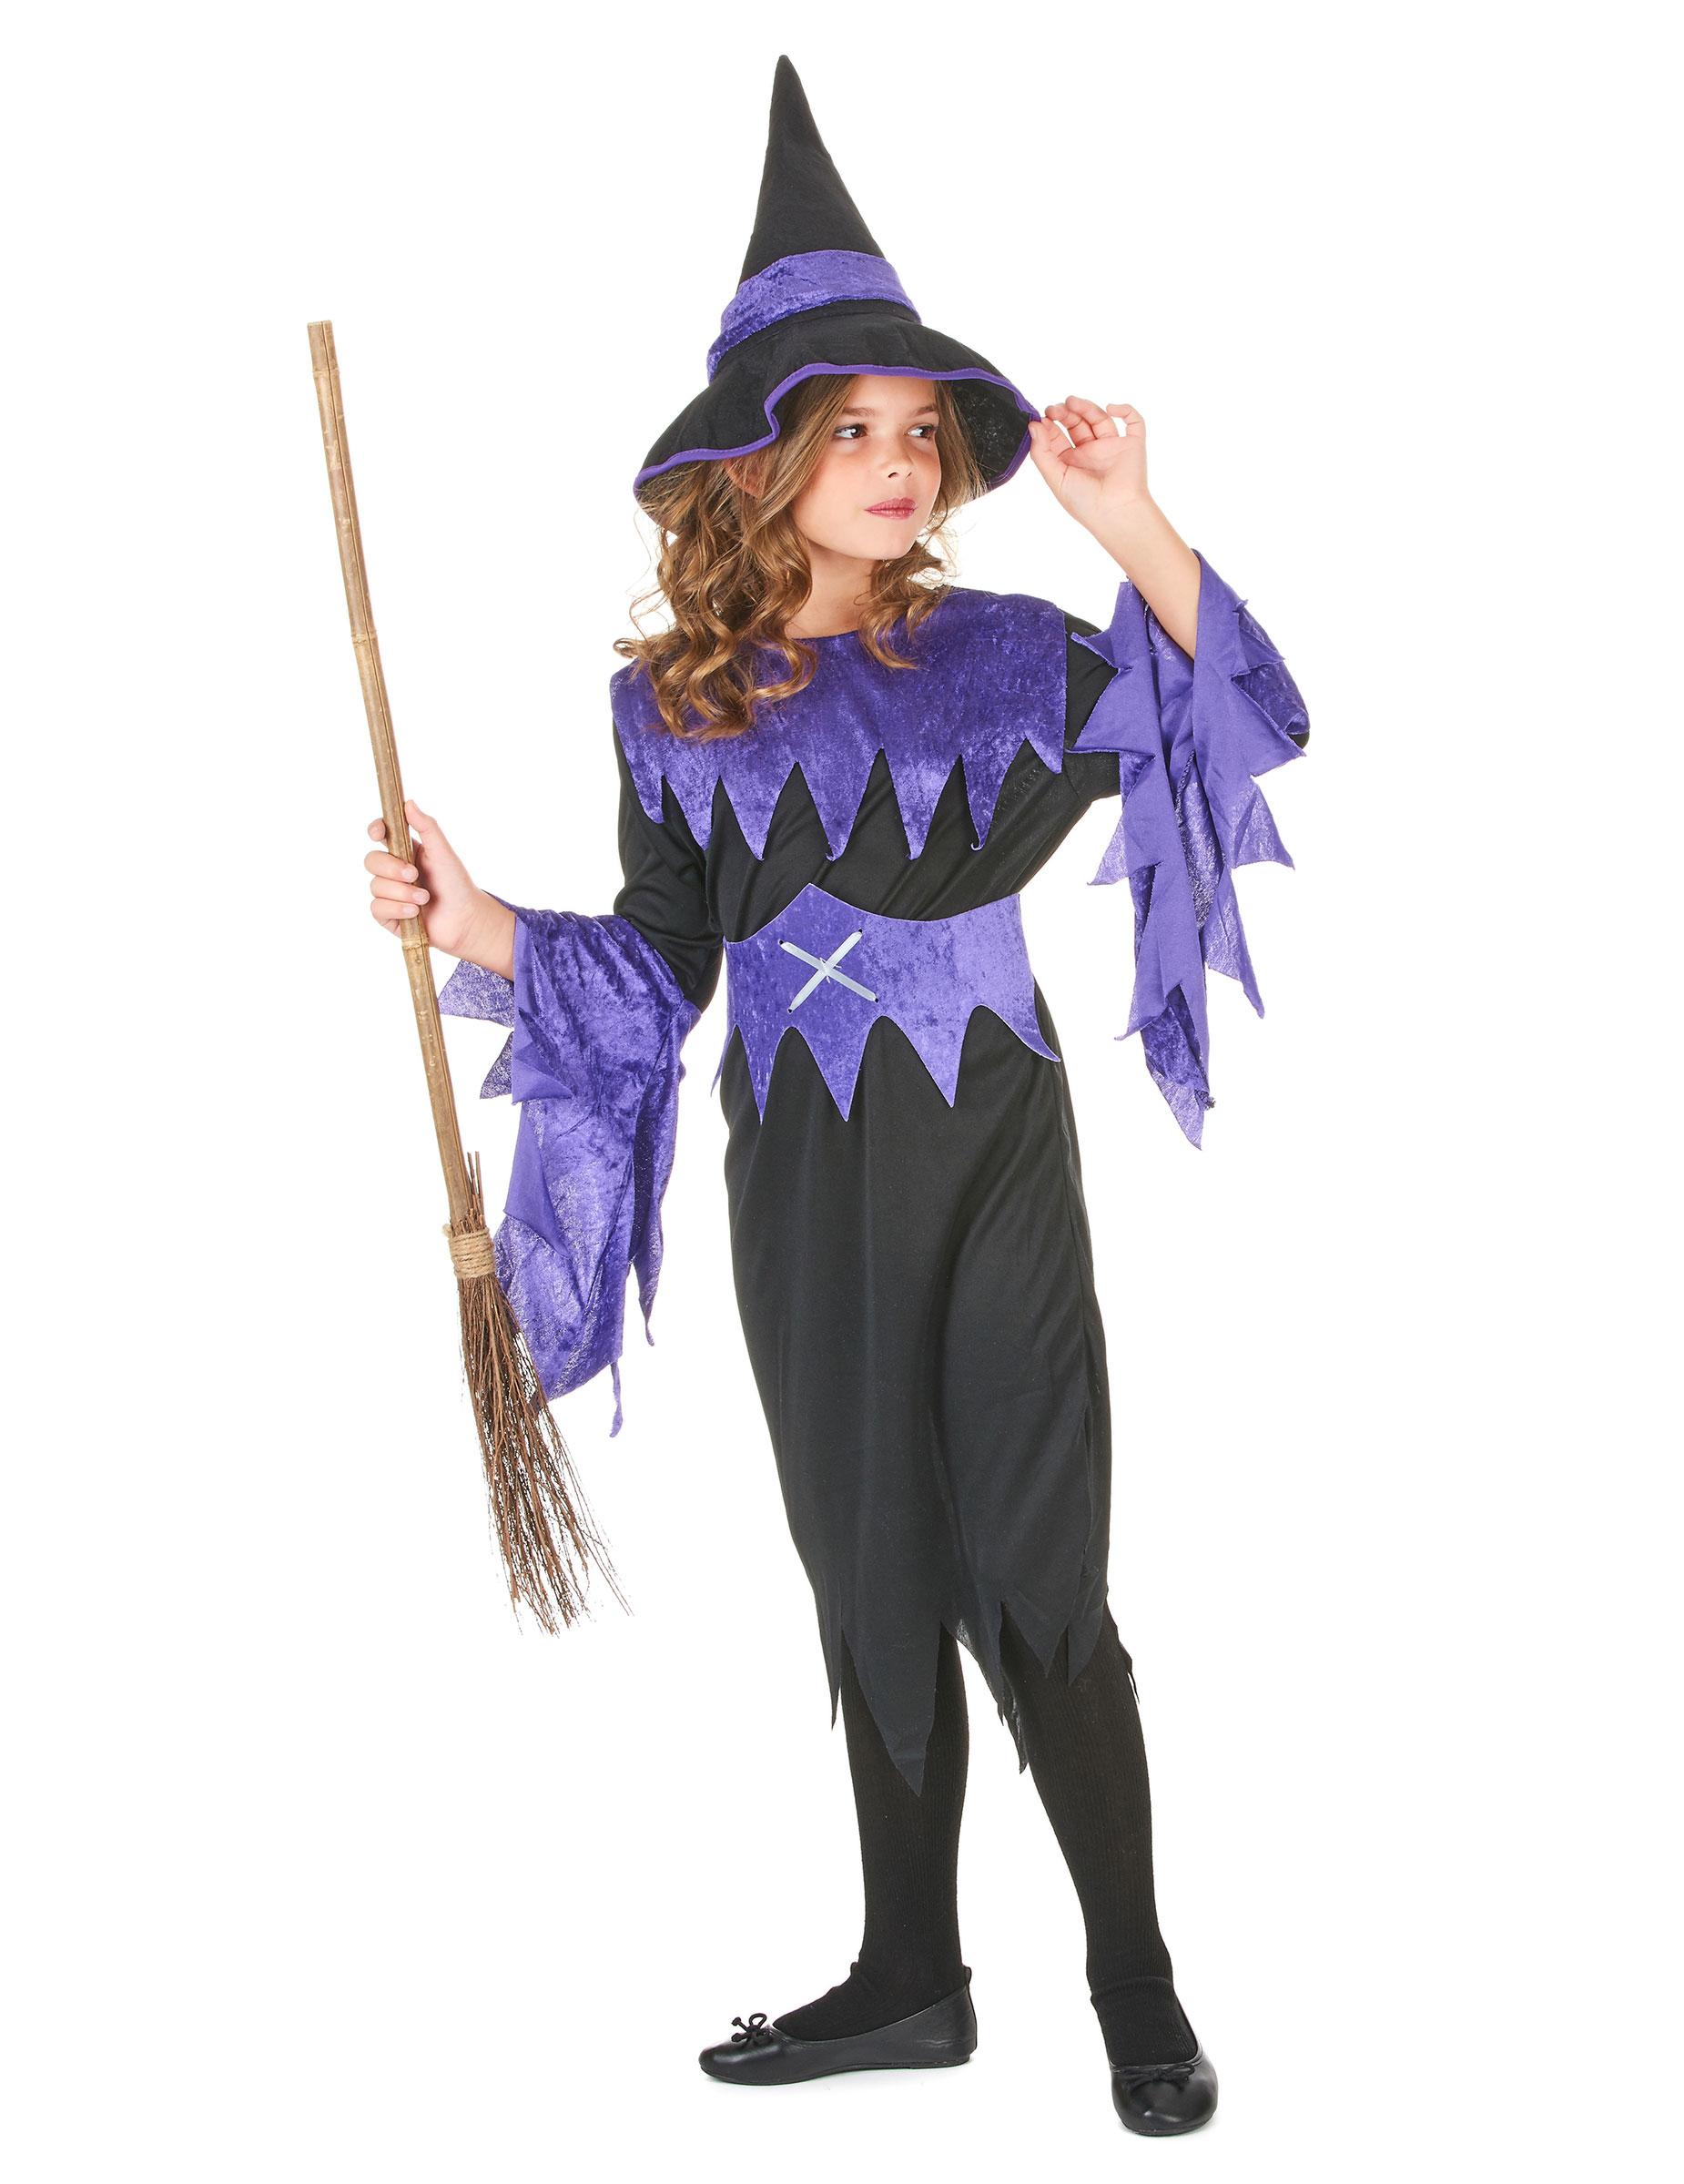 Costume da strega per Halloween da bambina su VegaooParty bb9de58d674c